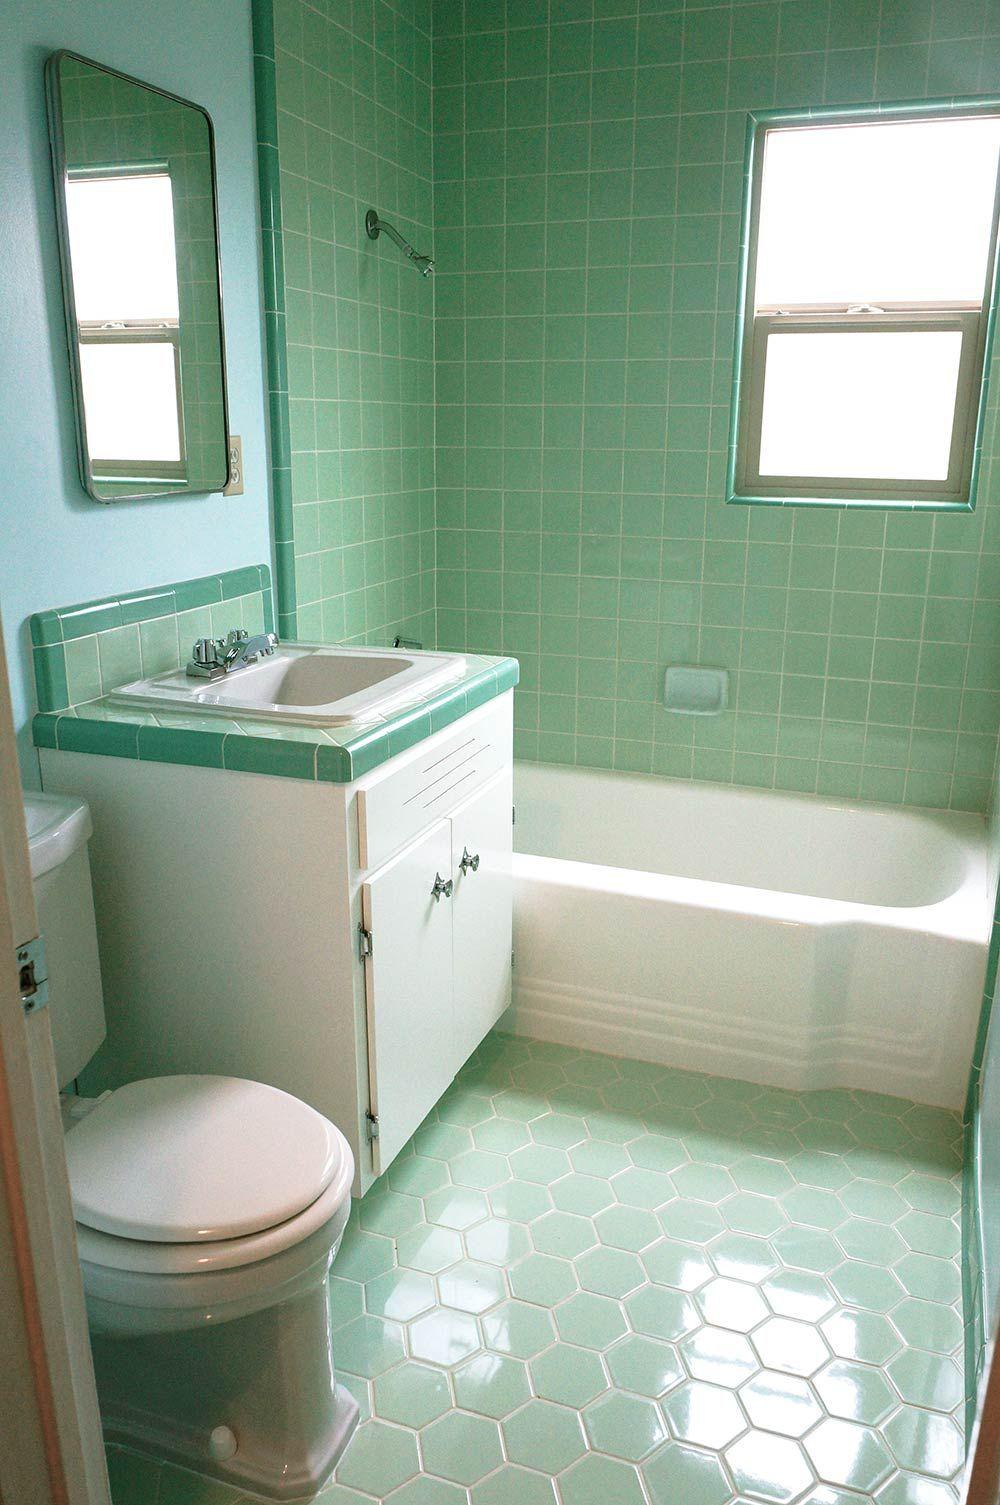 Ванная 9 кв м в стиле ретро